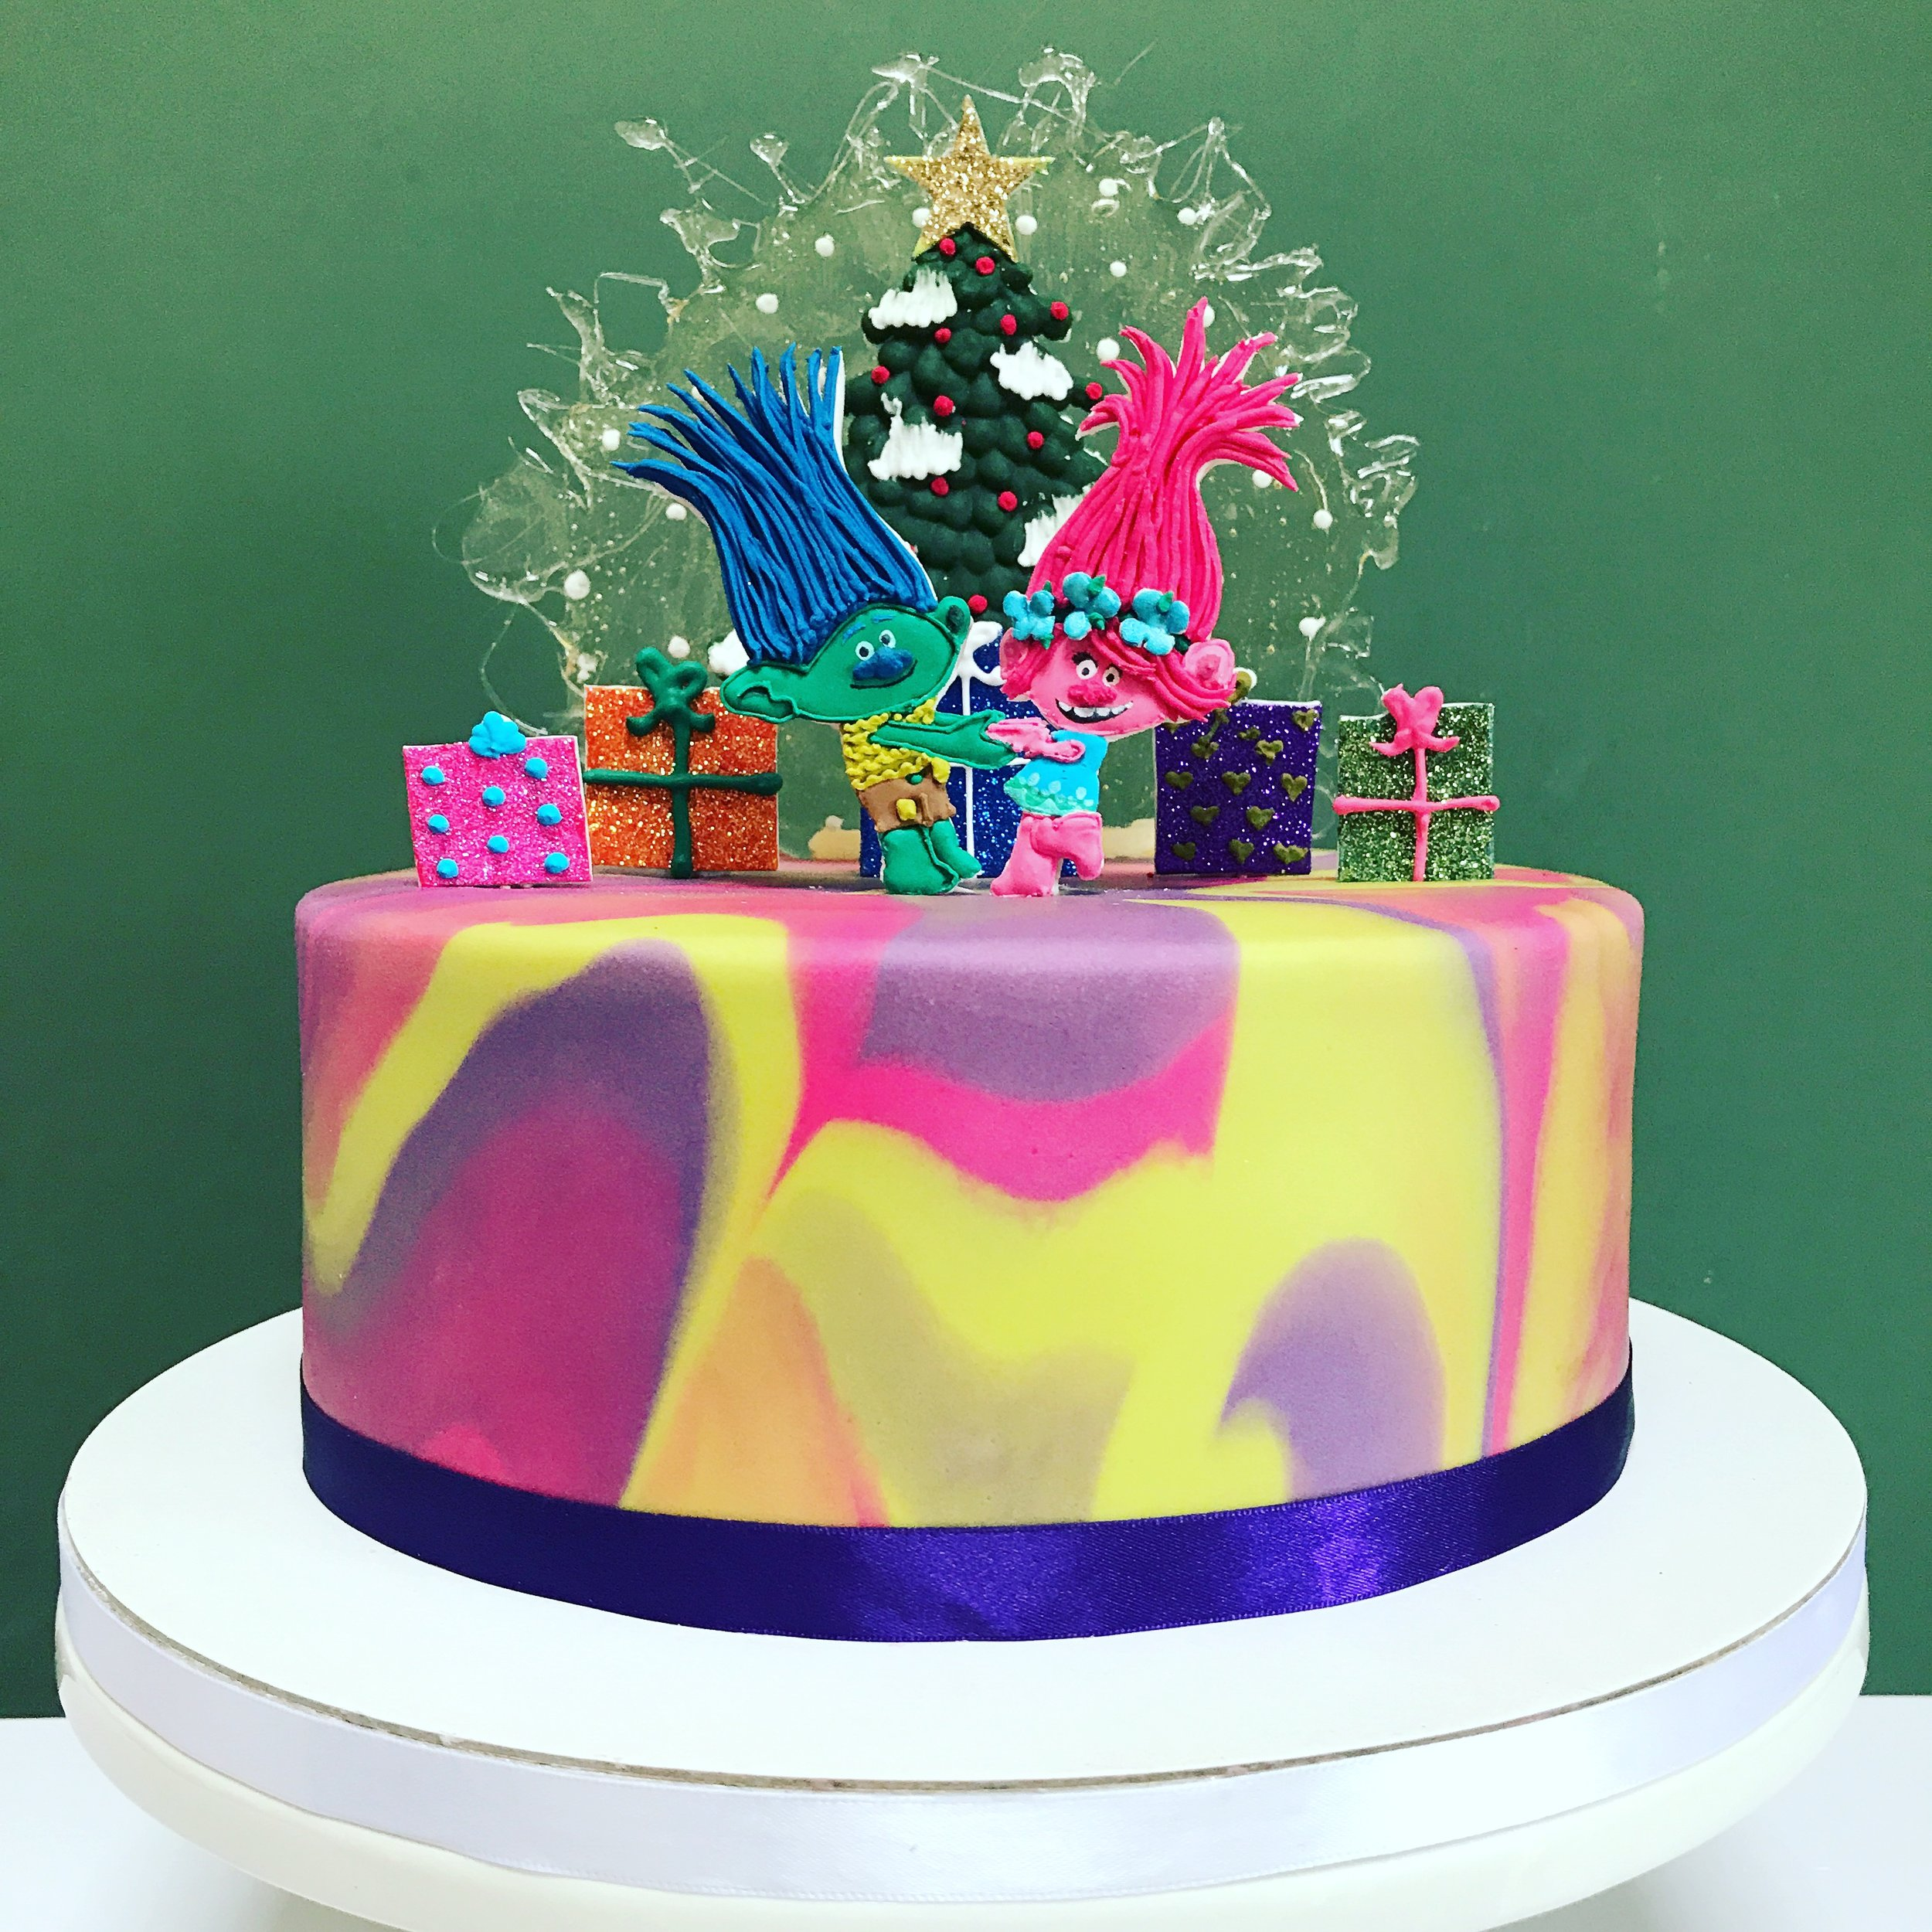 Trolls Christmas Cake.JPG